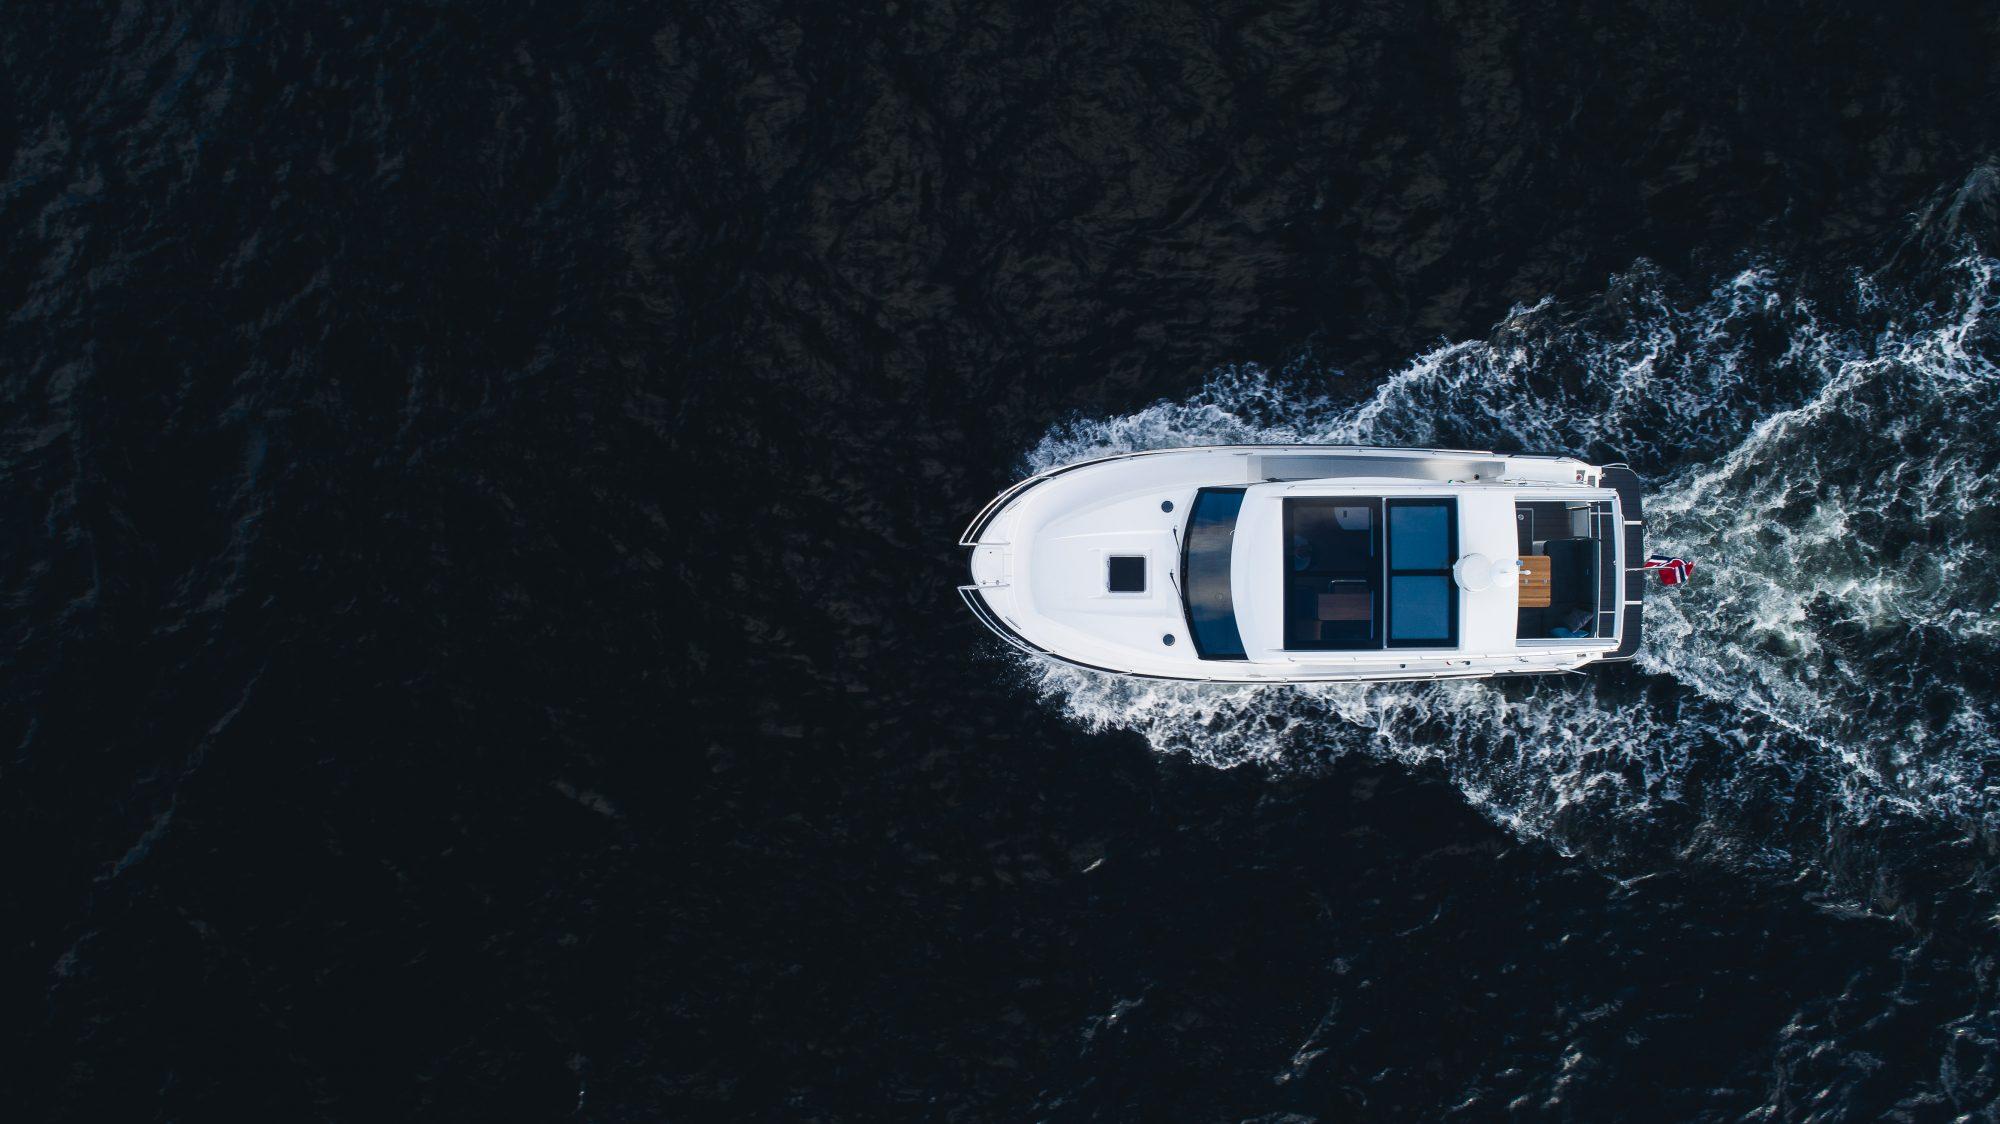 Jotun forenkler båtpussen! Årets nyhet fra Jotun Yachting